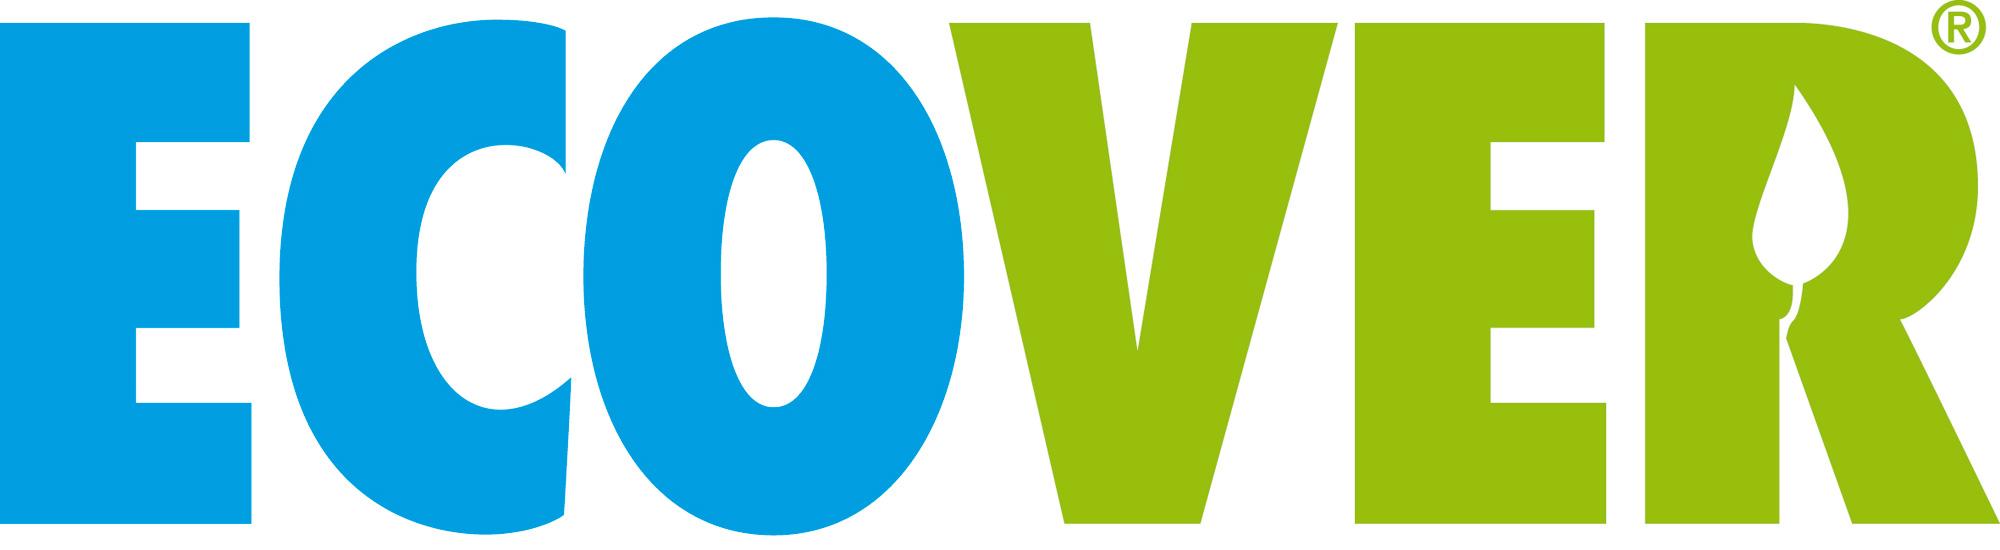 ecover-logo575c7f8f876c9